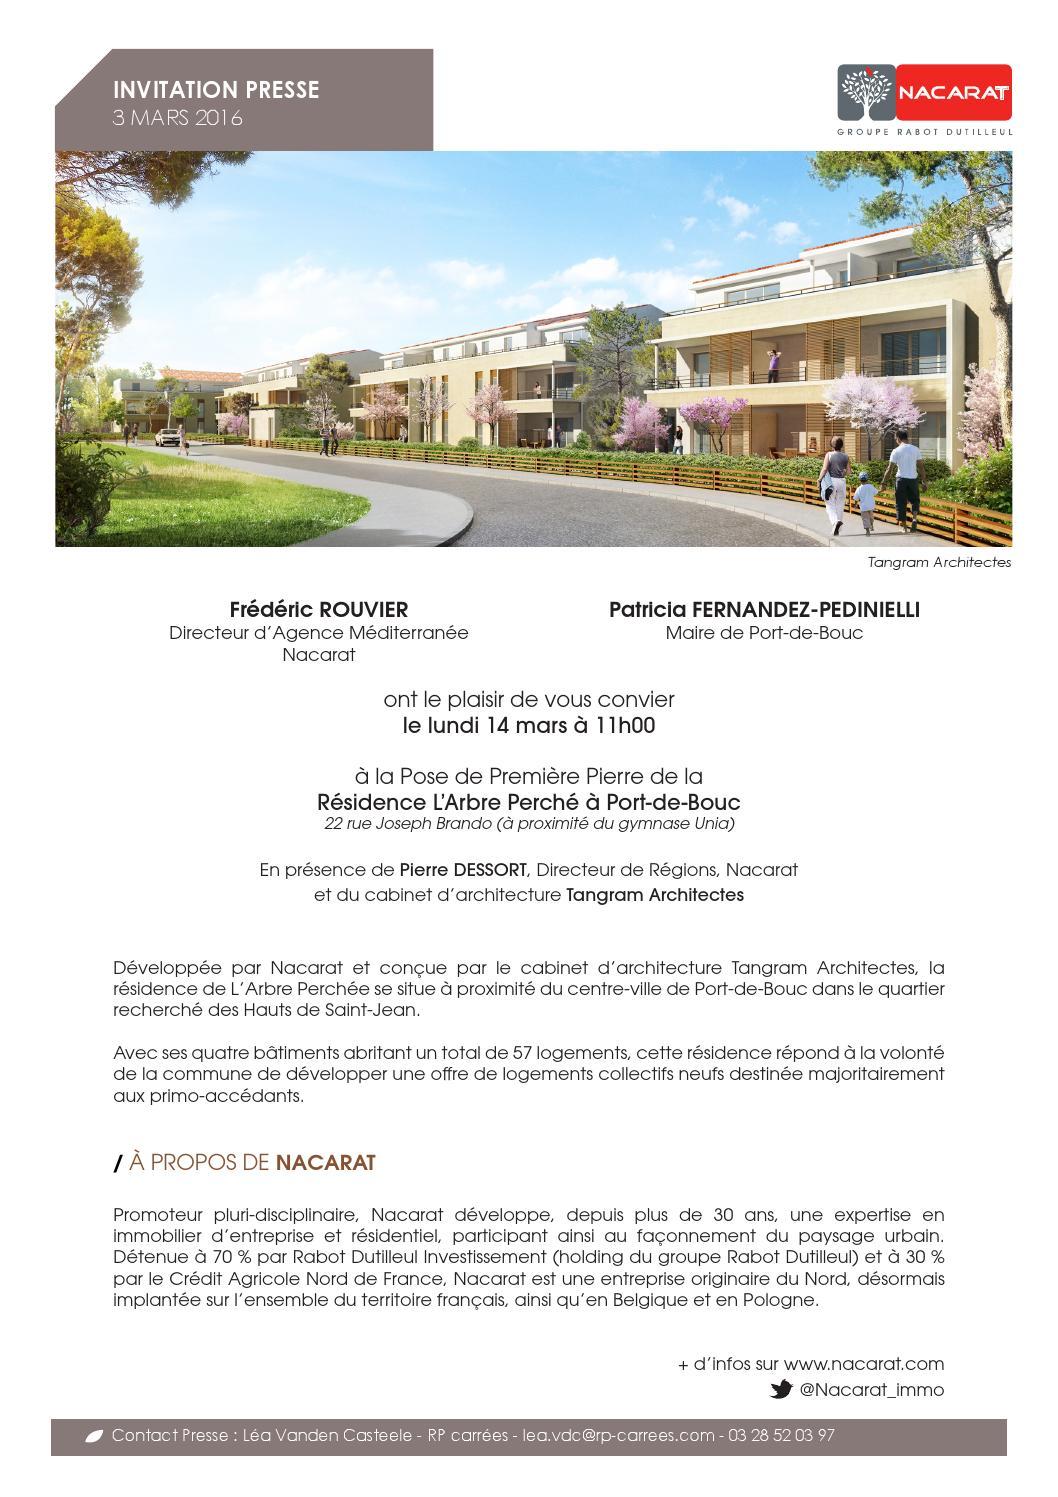 Invitation presse arbre perch by nacarat immo issuu - Patricia fernandez port de bouc ...